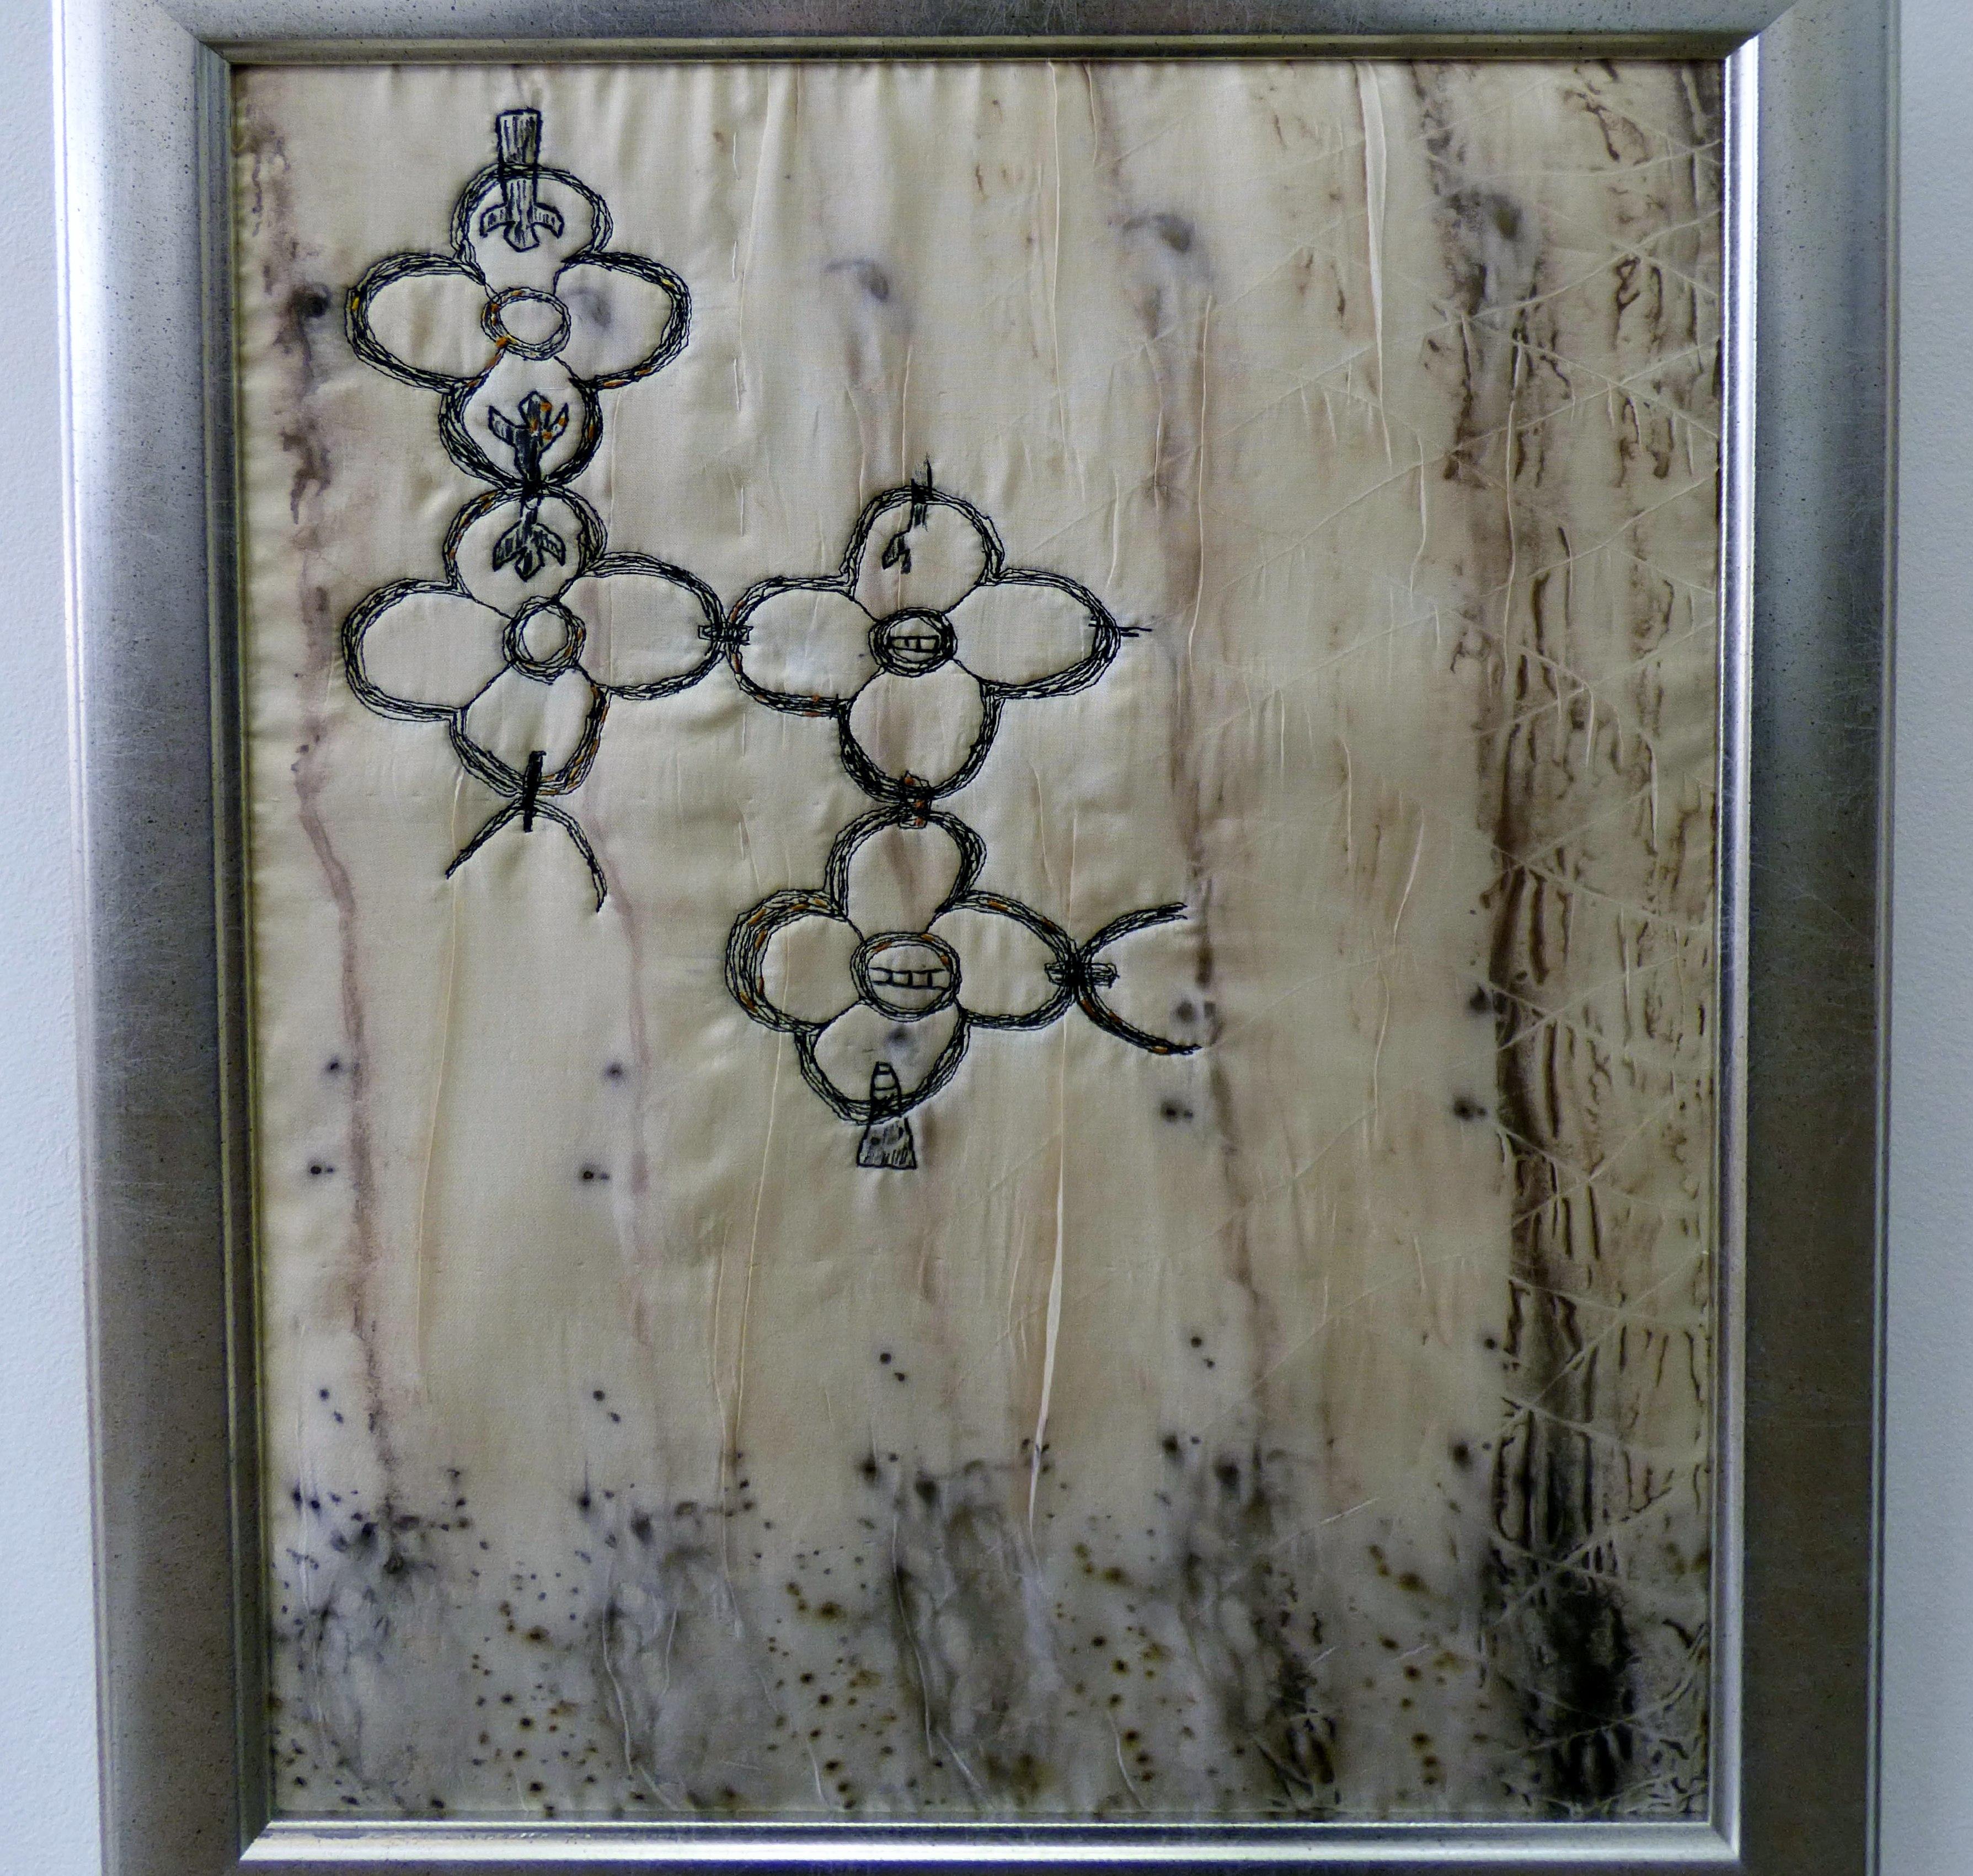 MEMORIES OF WINDOW GRILLS by Marguerita McBride, Parbold EG